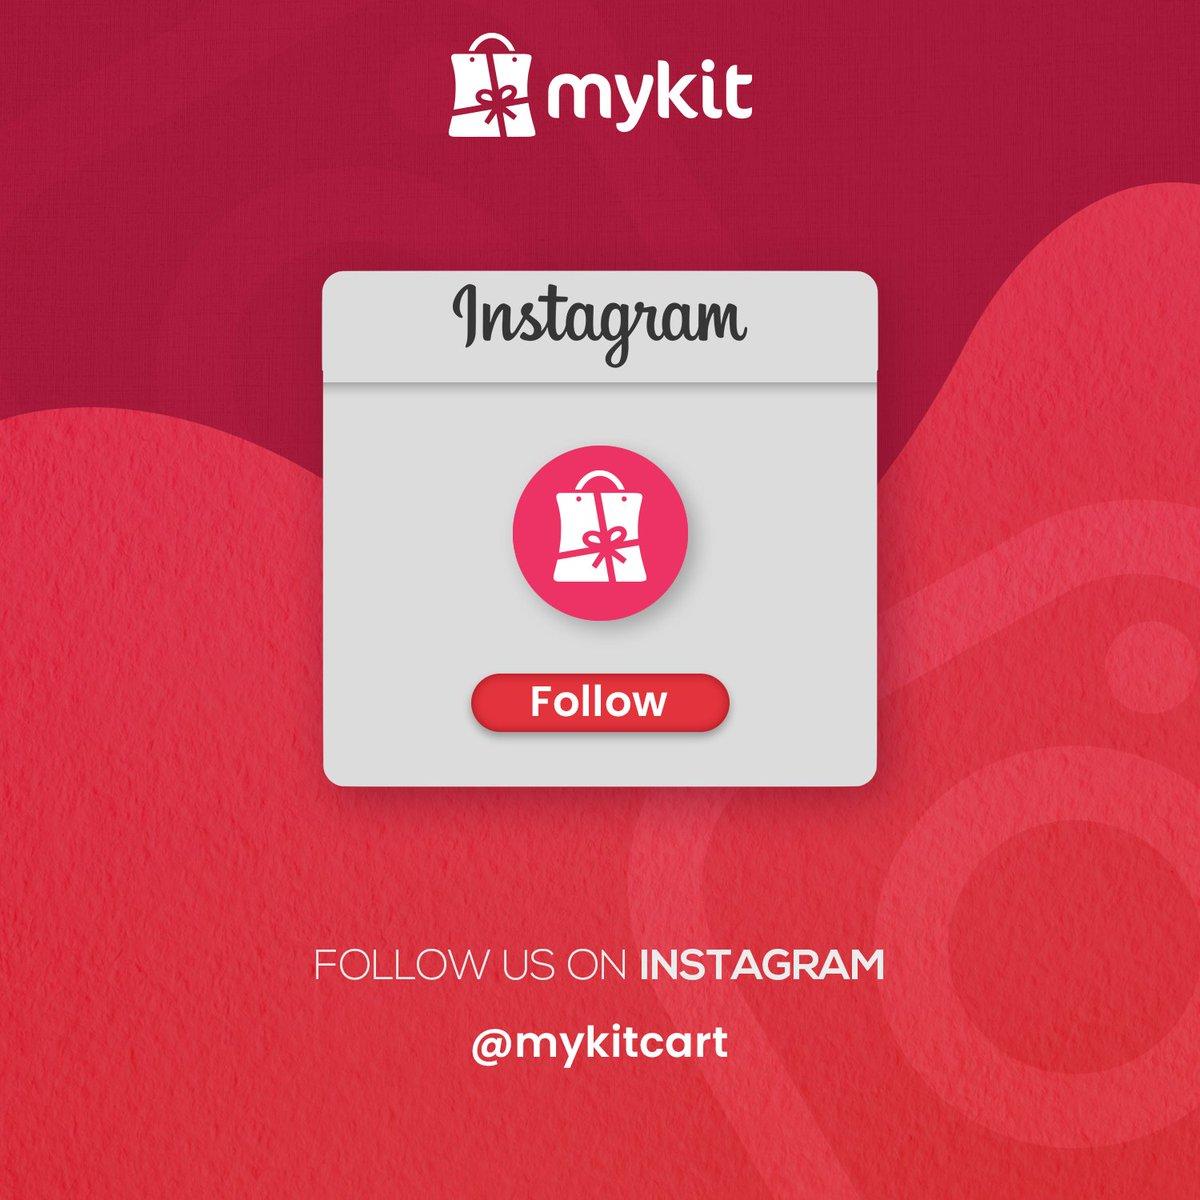 Stay connected...Stay updated... #mykitcart #mykit #follow #followus #onlineshopping #brandyourhome #kannur #kerala https://t.co/wXwpnYQZ5T